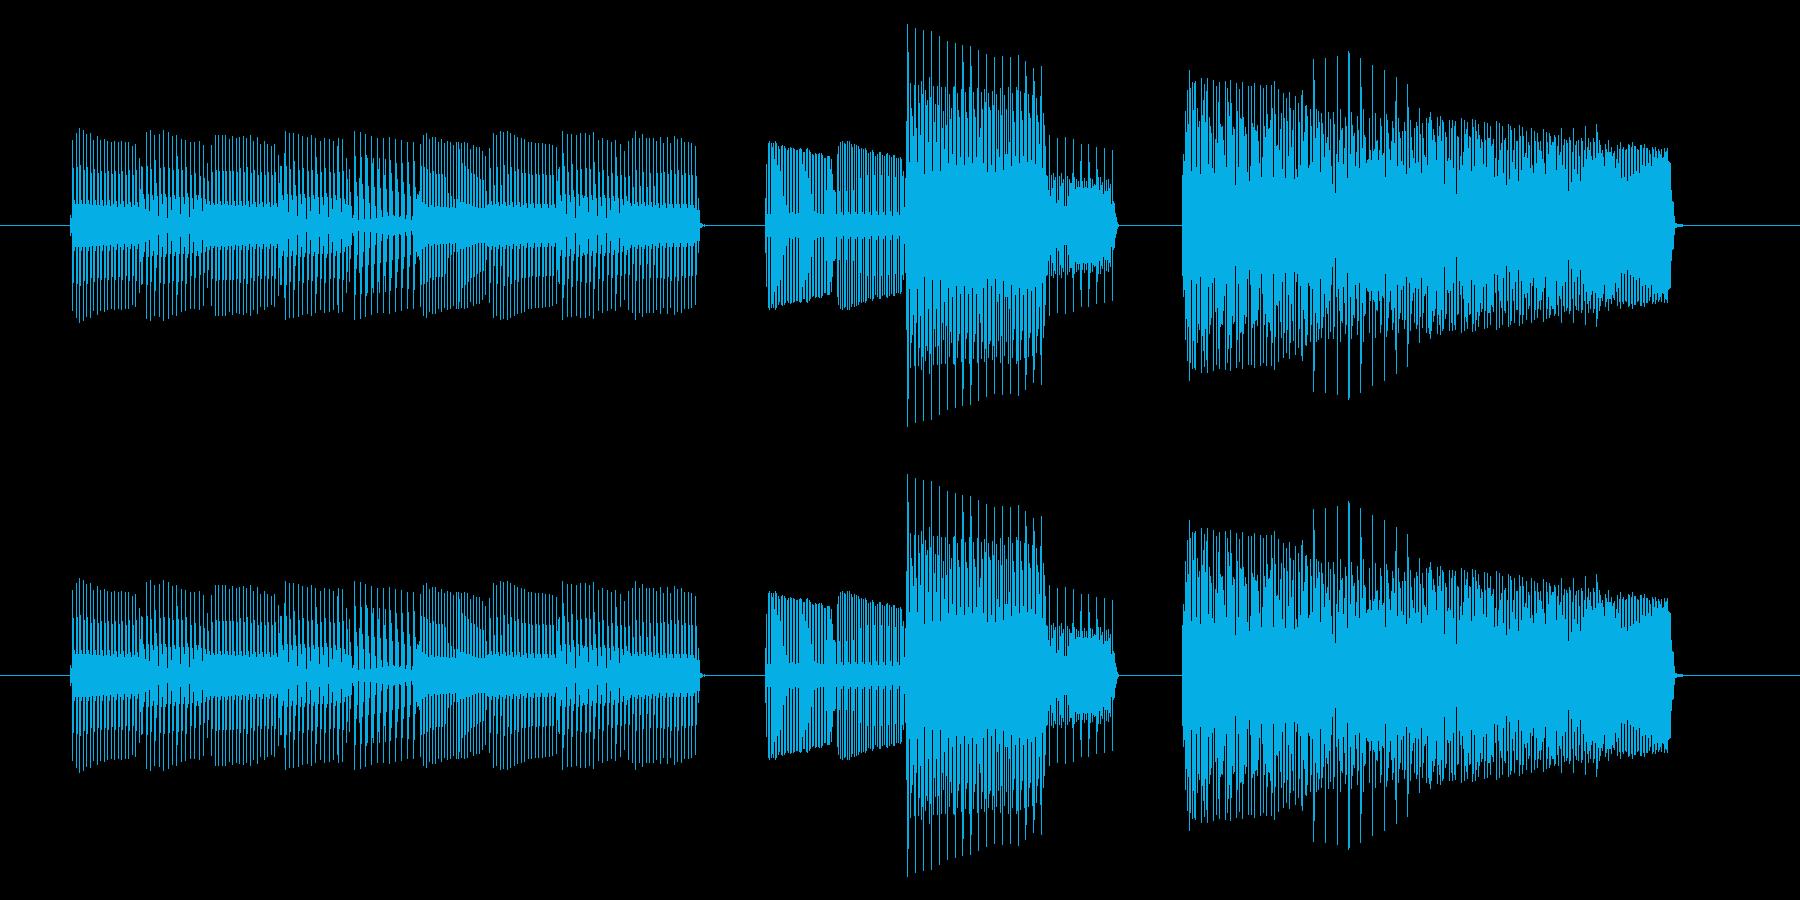 NES 汎用 B03-4(ミス)の再生済みの波形